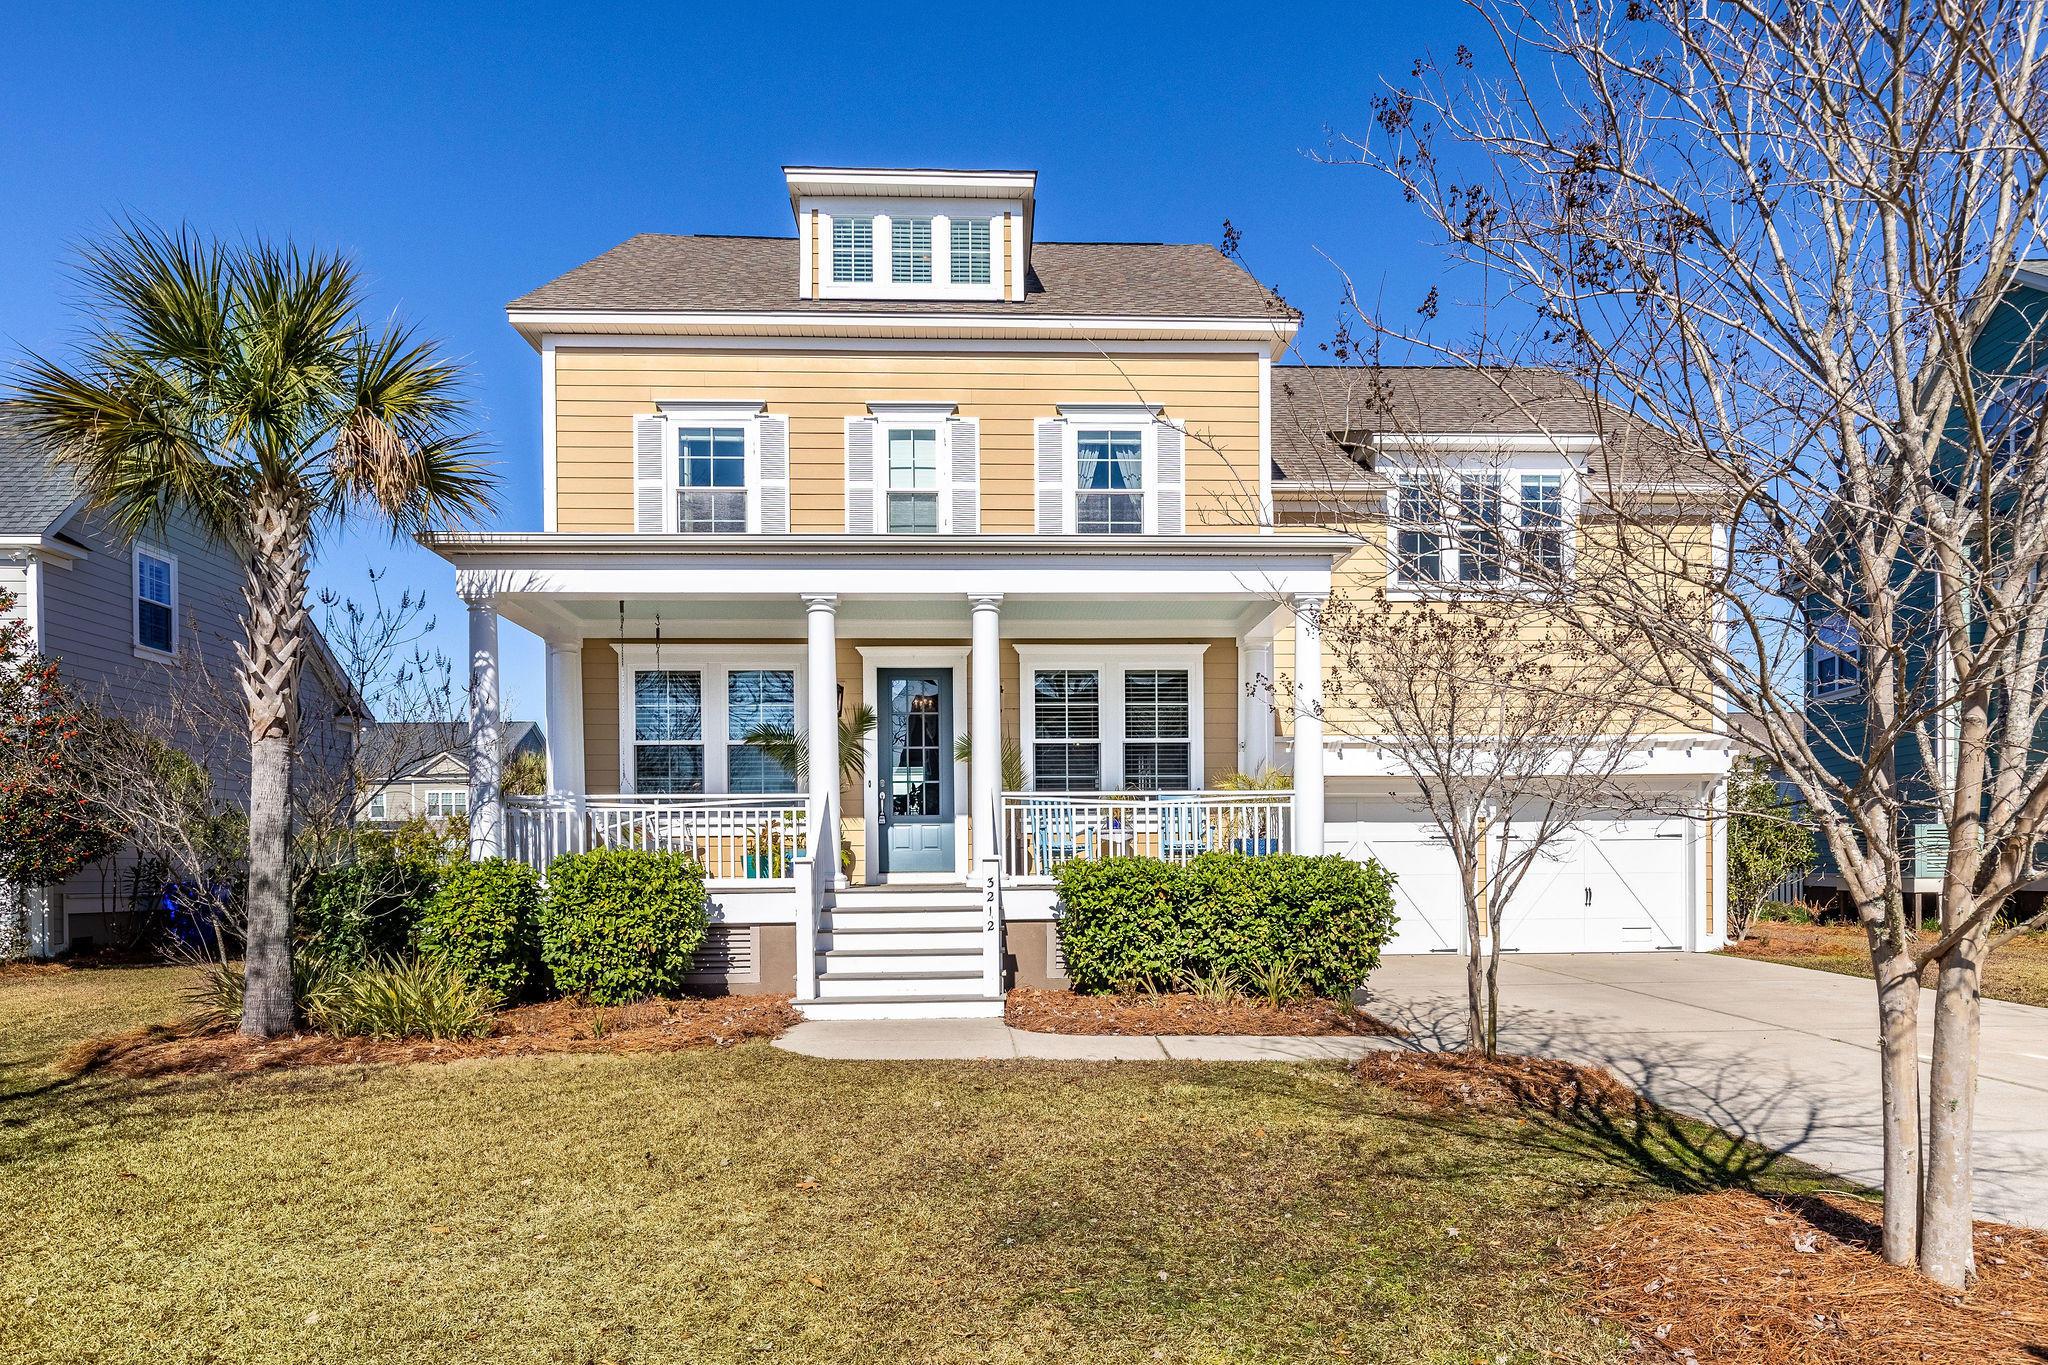 Dunes West Homes For Sale - 3212 Hatchway, Mount Pleasant, SC - 46